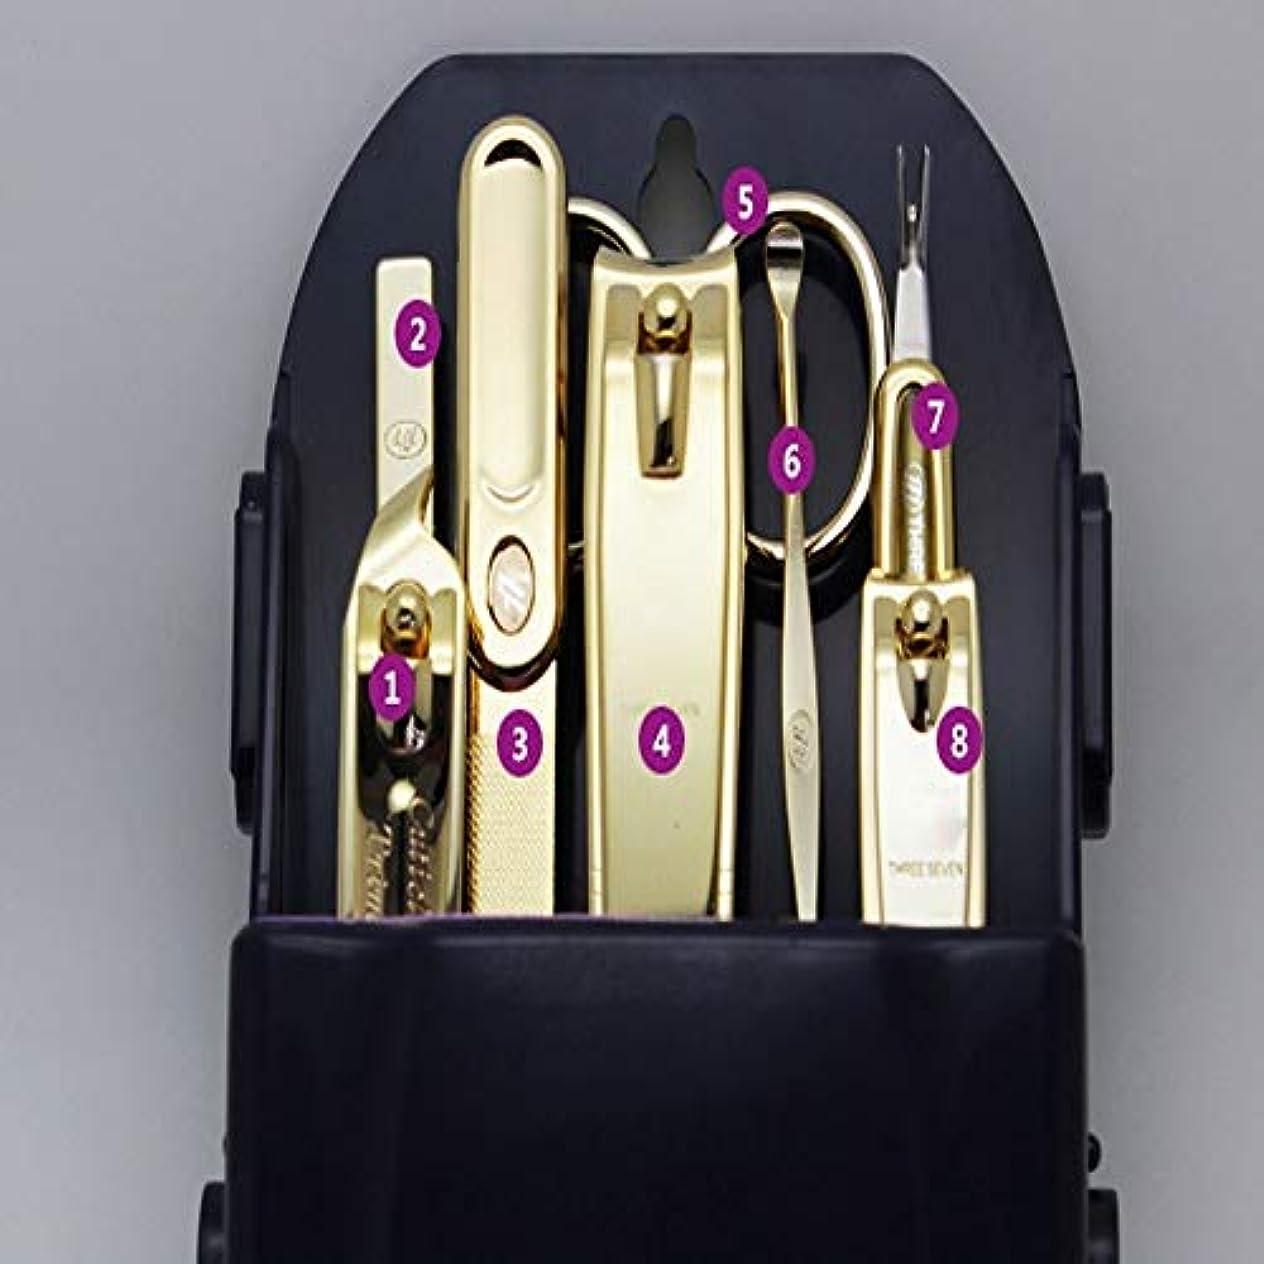 ZGSH 8セットのマニキュアネイルツールセット、ホームマニキュアネイルクリッパーセット、炭素鋼材料、高硬度 (Color : Gold)